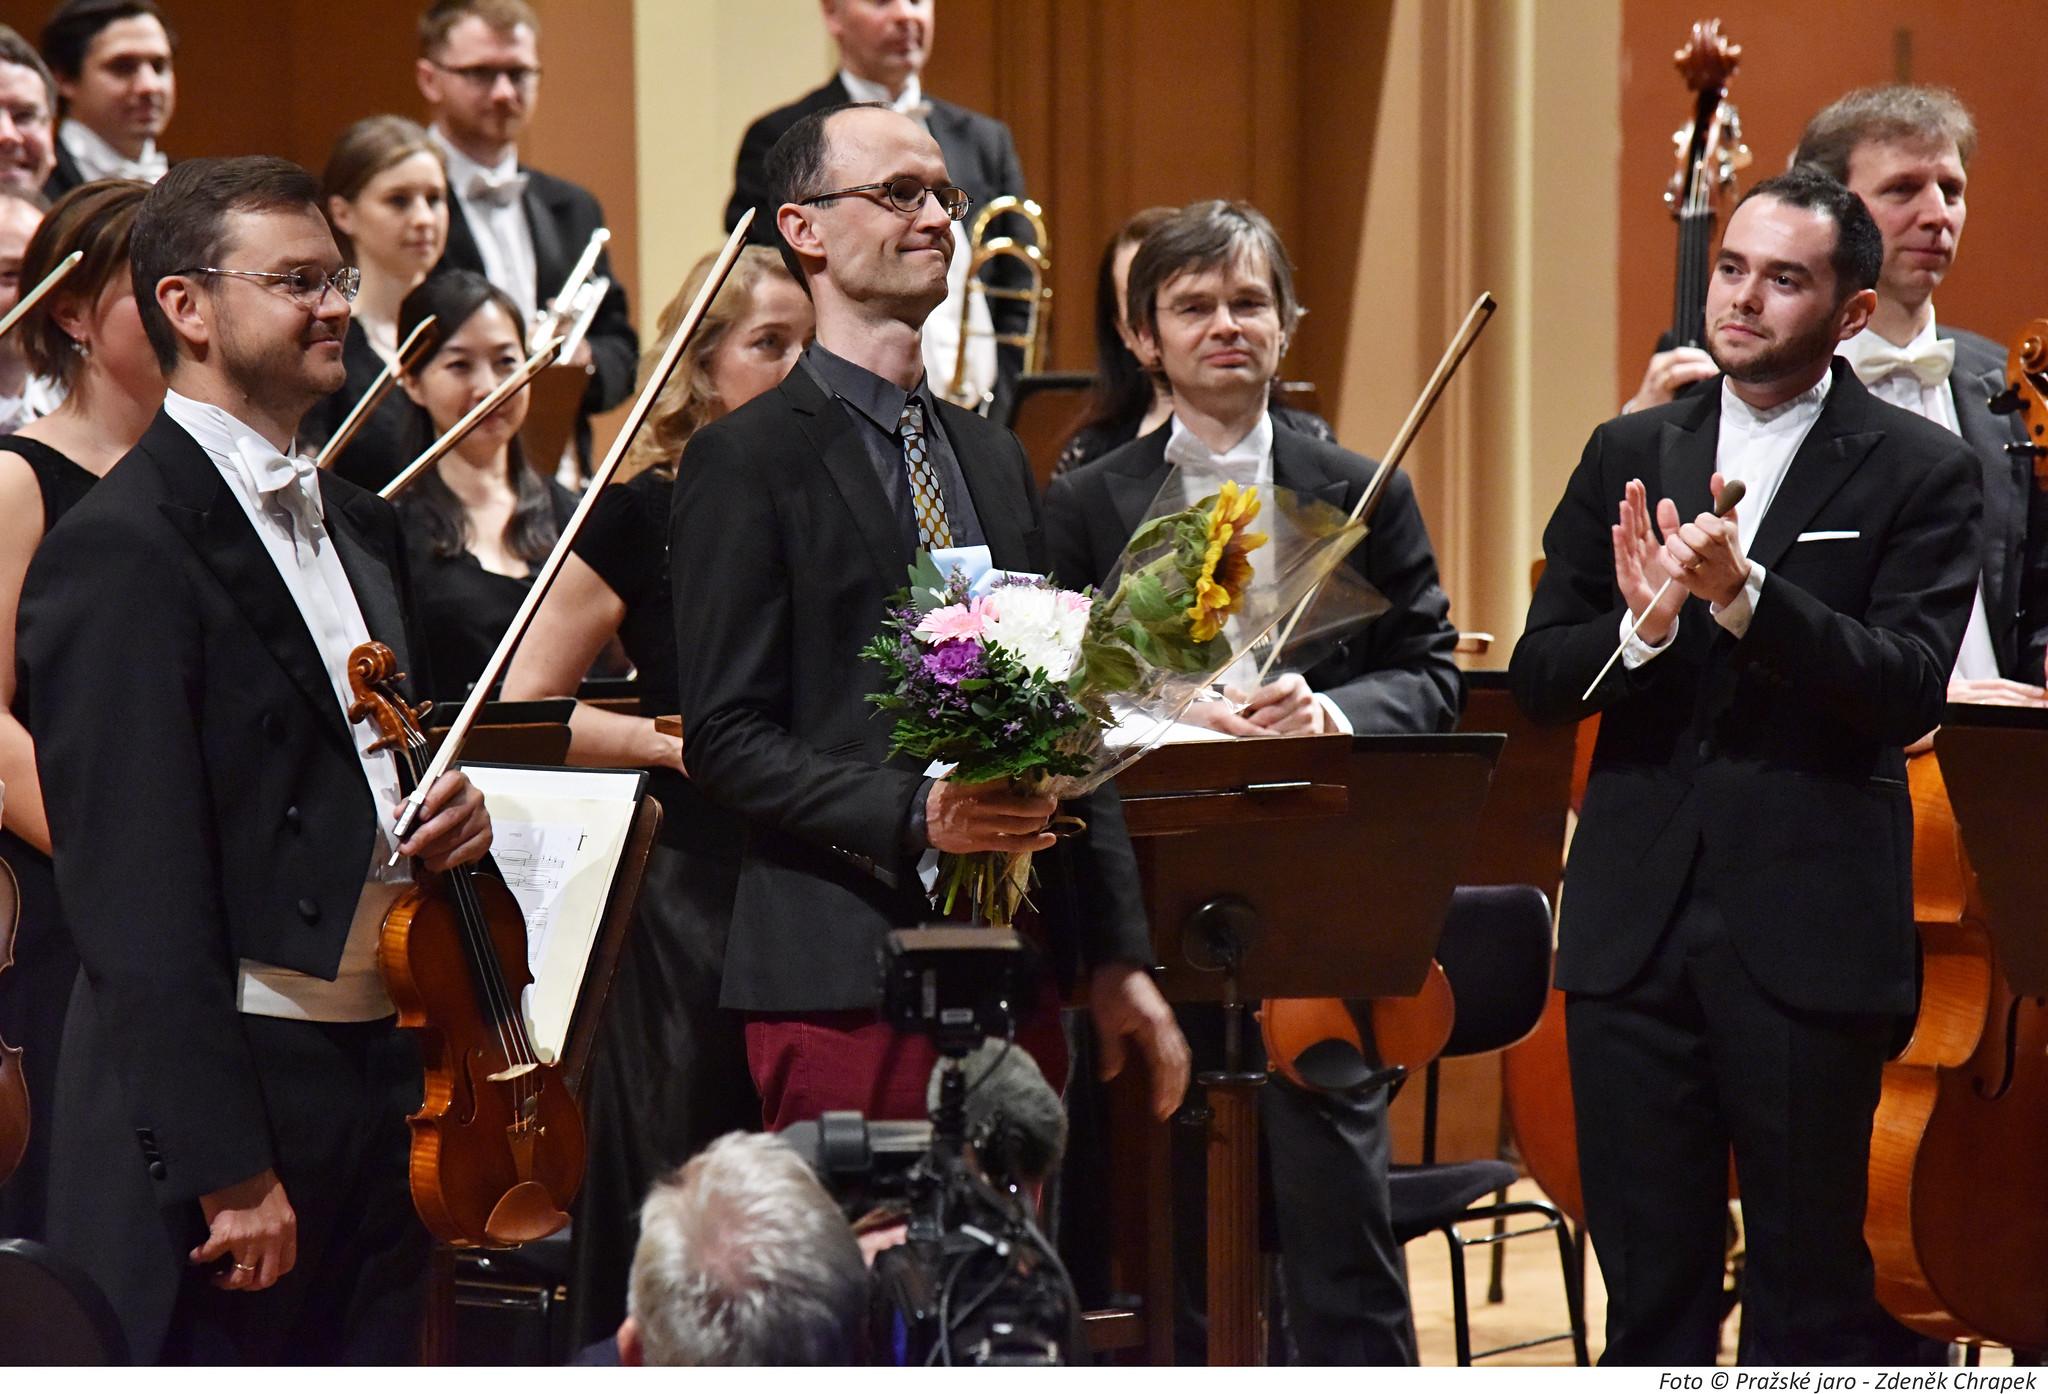 Šimon Voseček a Ben Glassberg